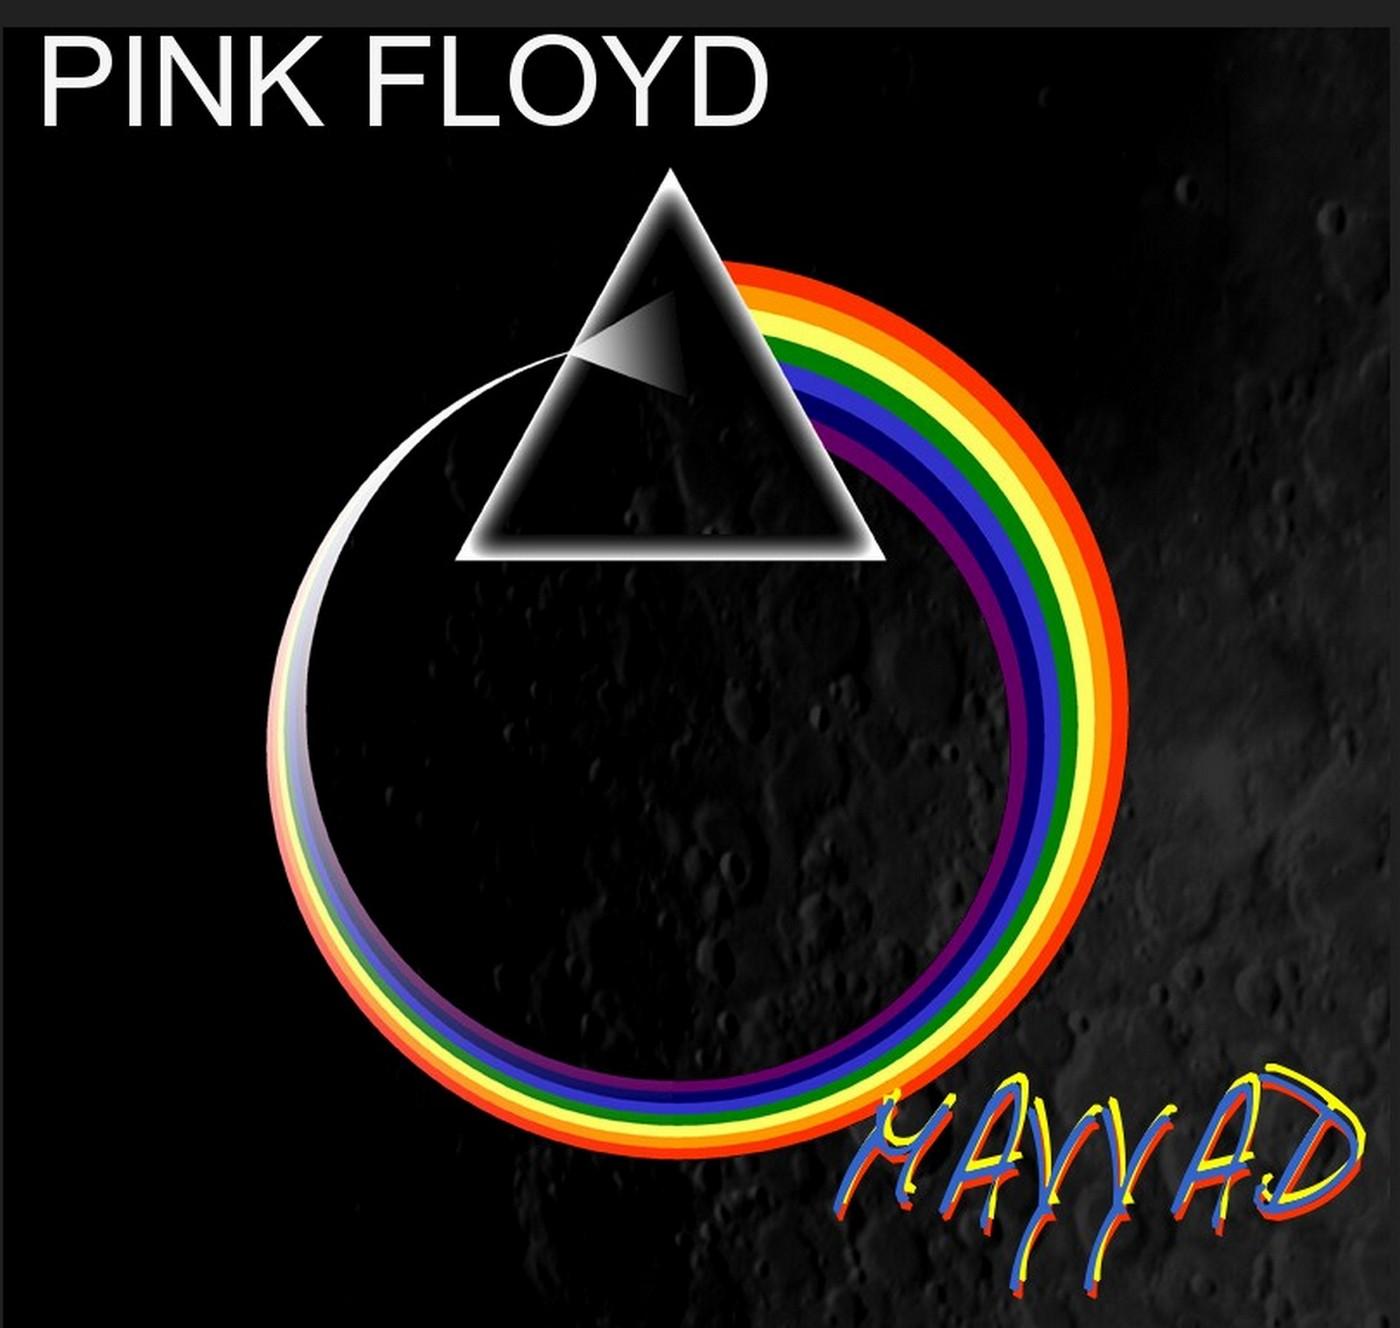 Pink Floyd music - Listen Free on Jango